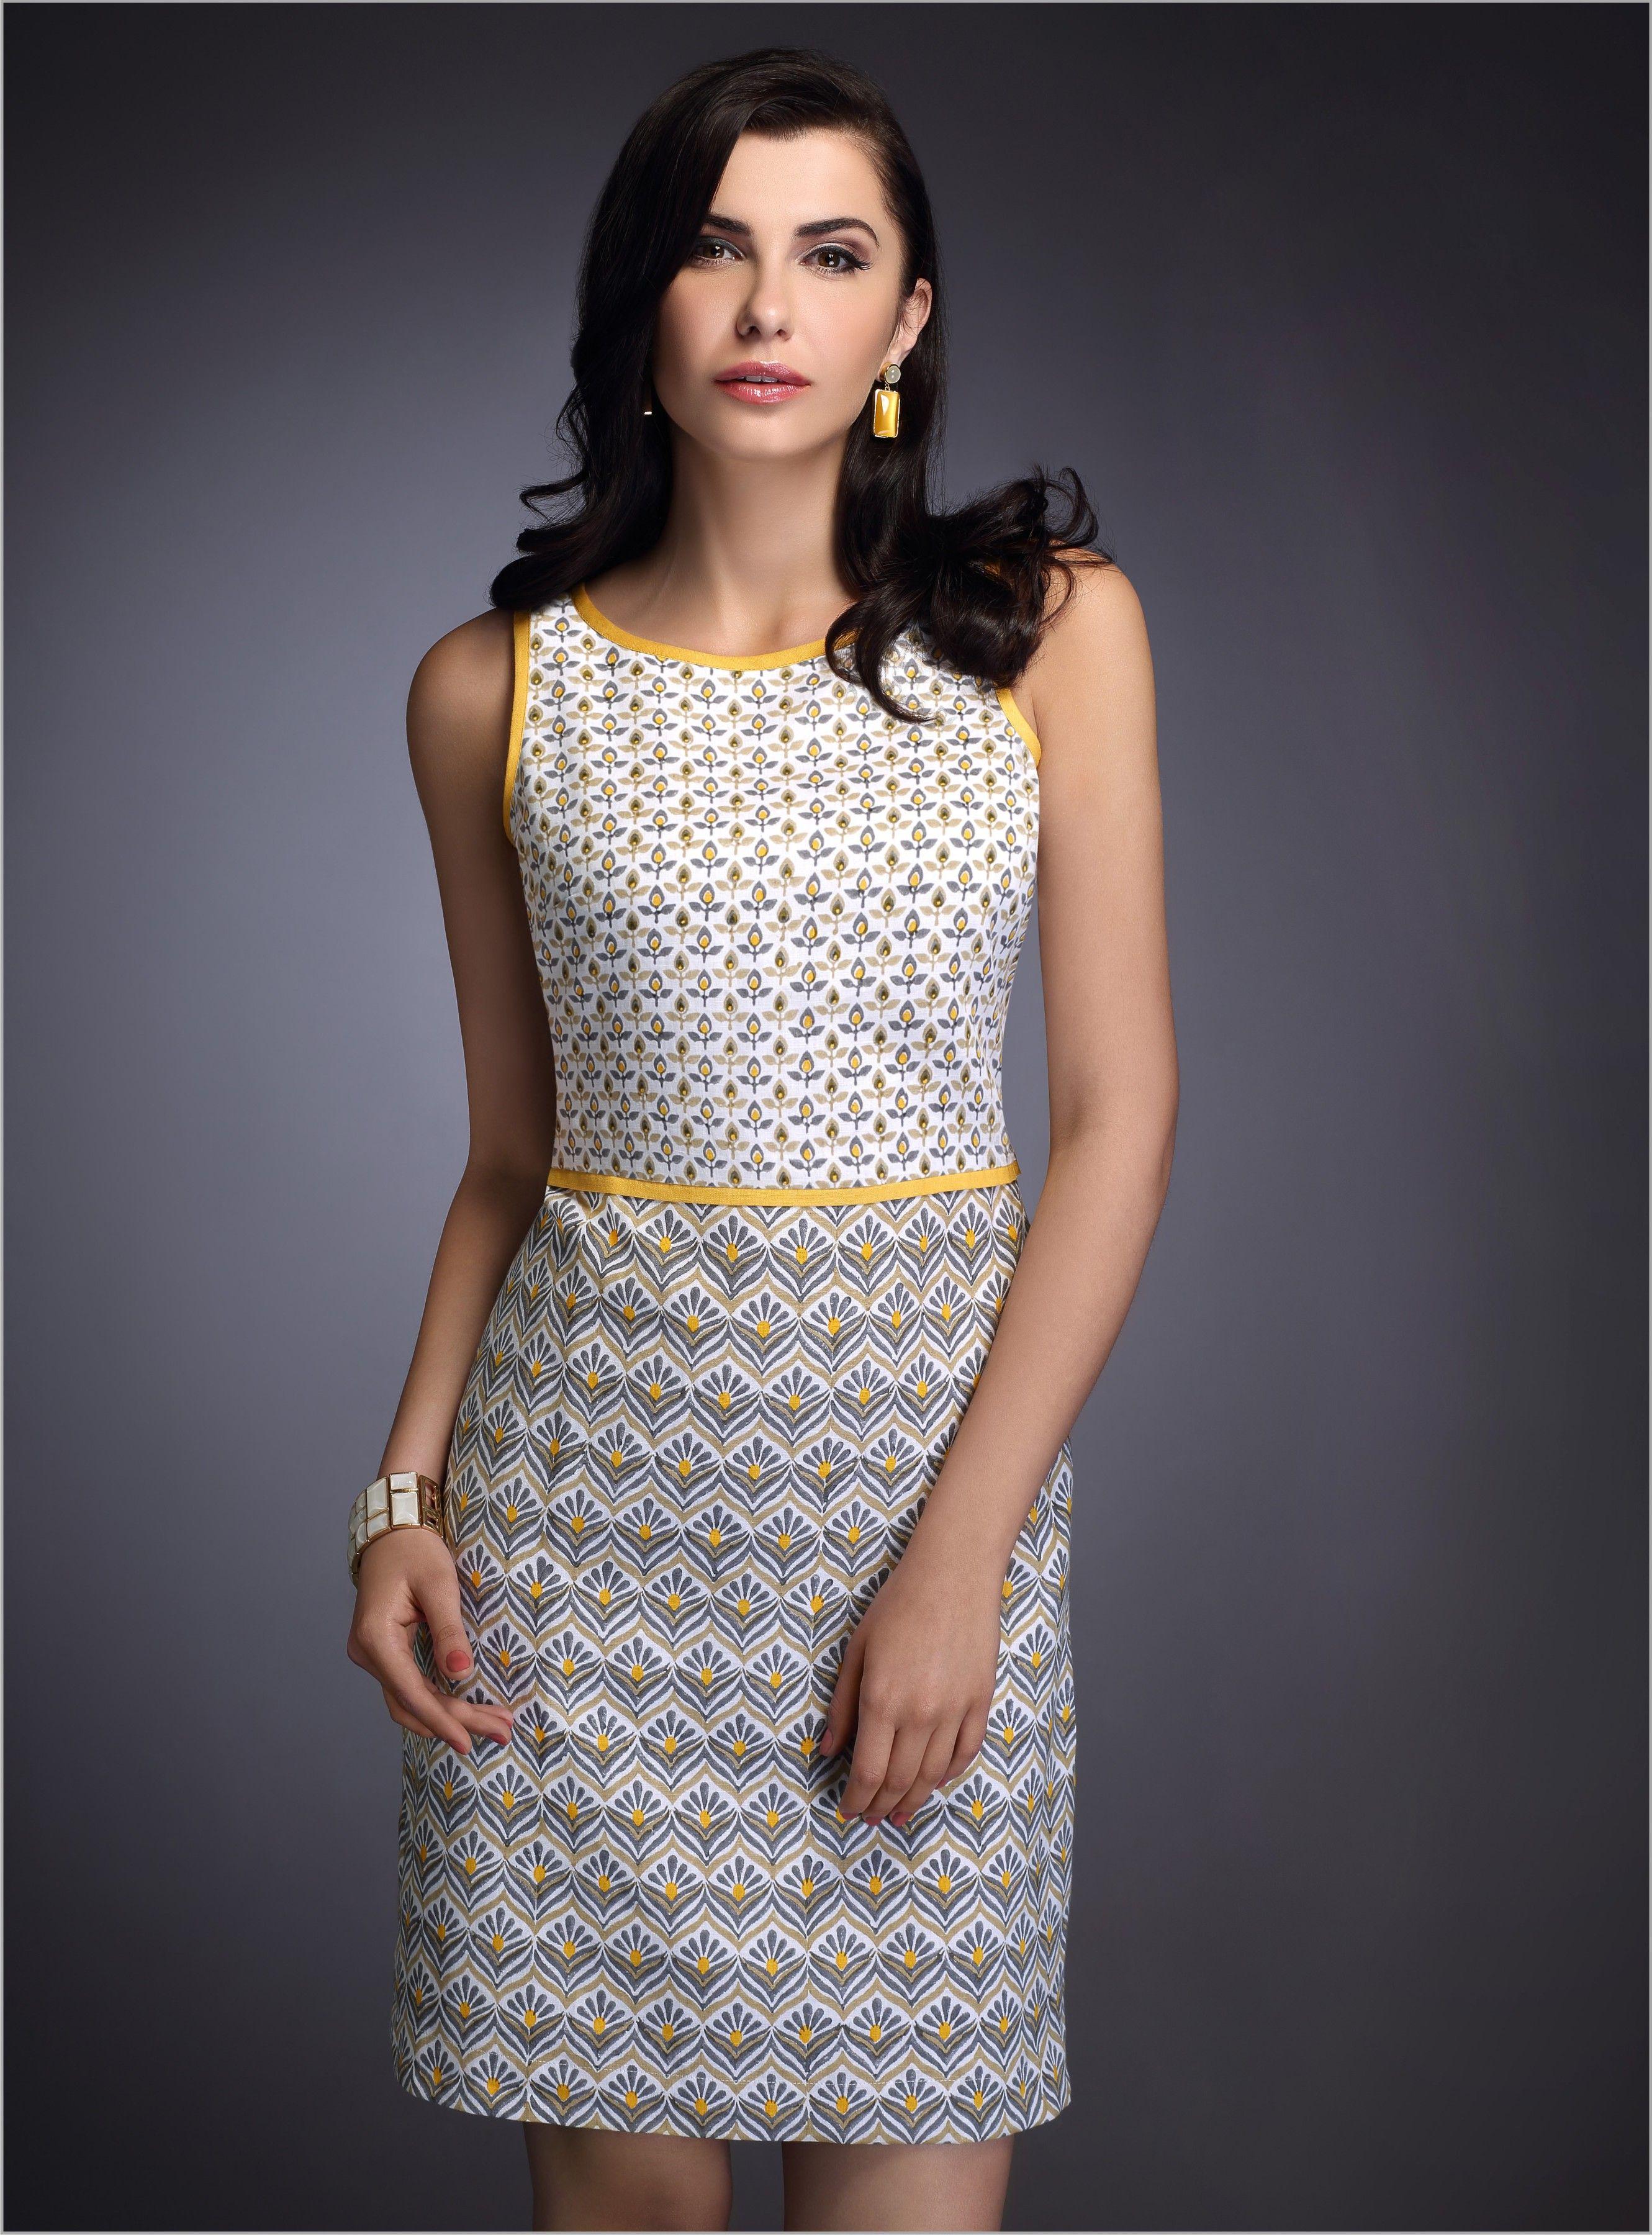 Fabels Fabindia Dress Day Summer Blockprint Cotton Knee Length Dresses Cotton Sundress Fashion [ 3600 x 2661 Pixel ]